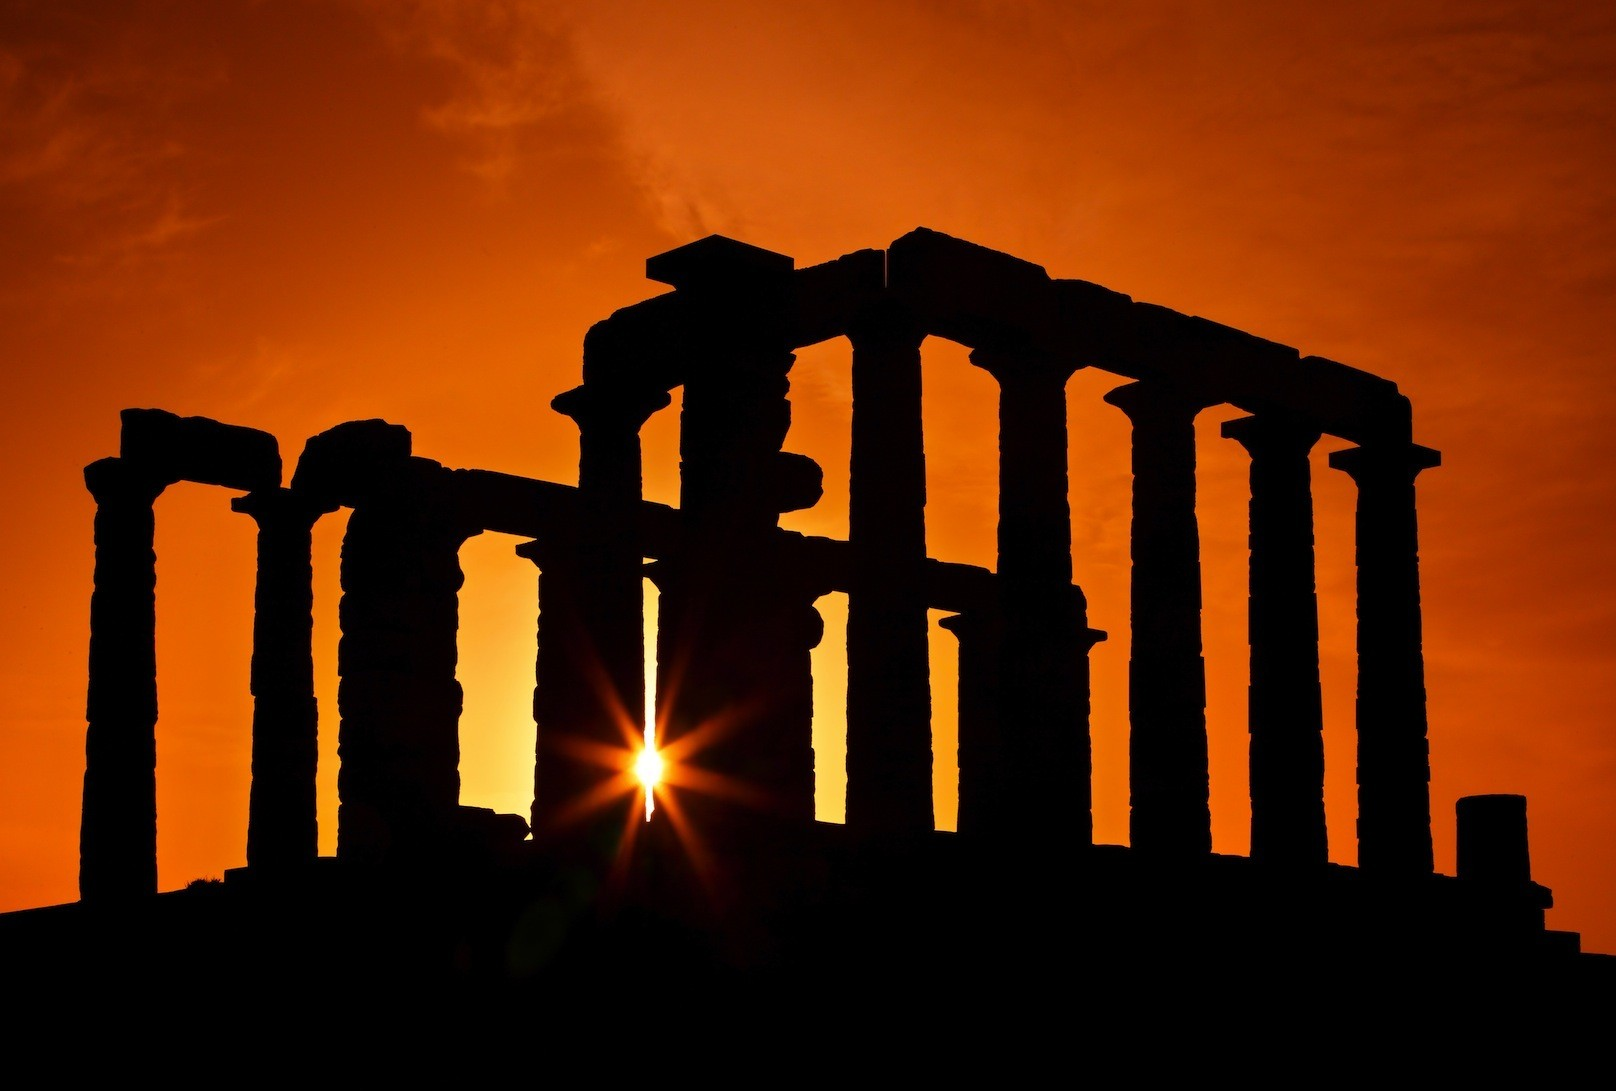 greece_athens_cape_sounio1-1616x1091.jpg